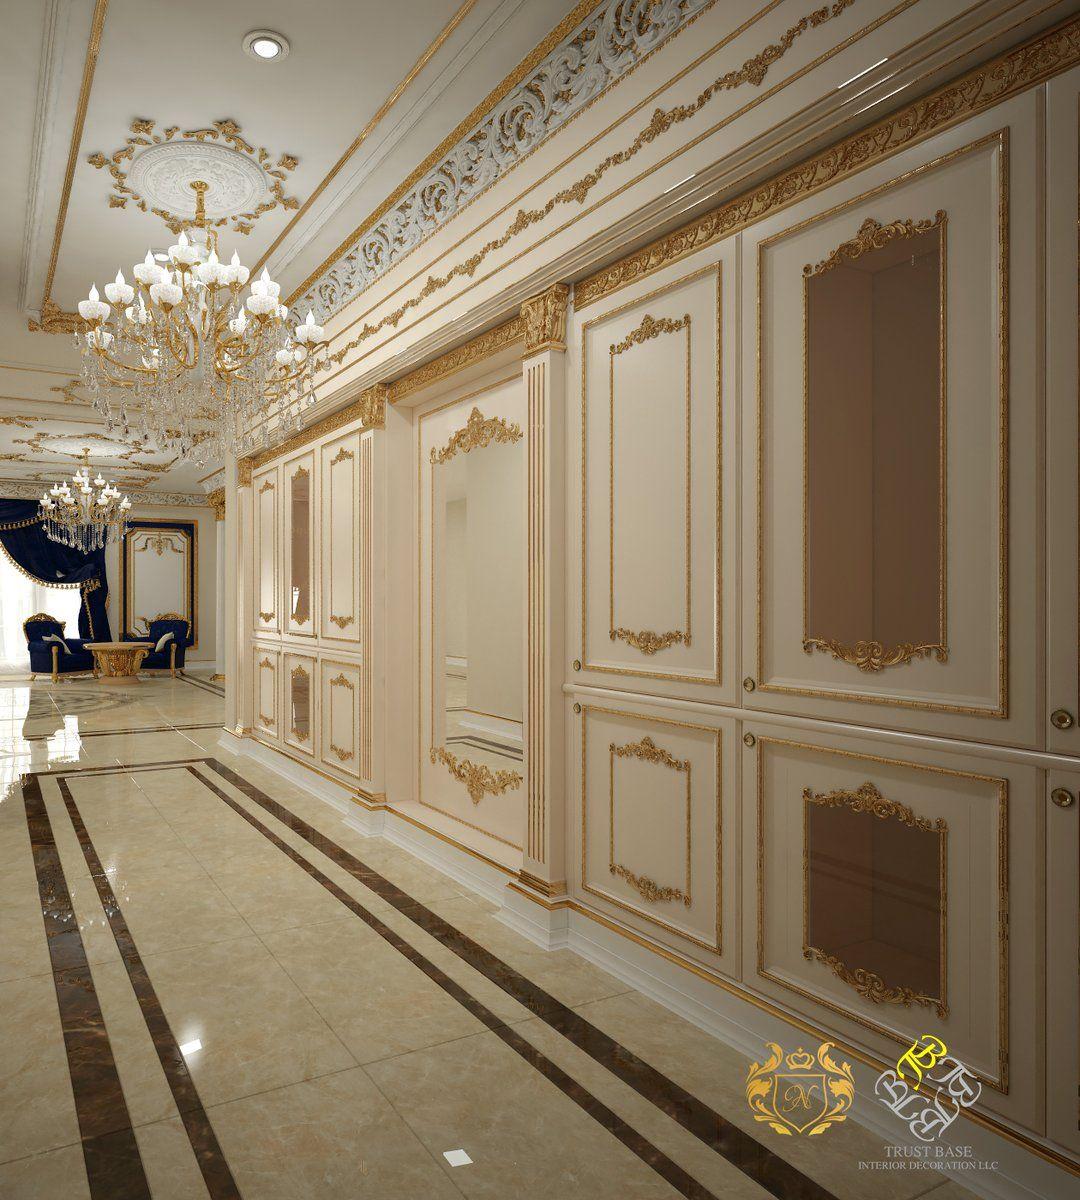 Residential Interior Design: Trustbasedecoration (@trustbasetb1)